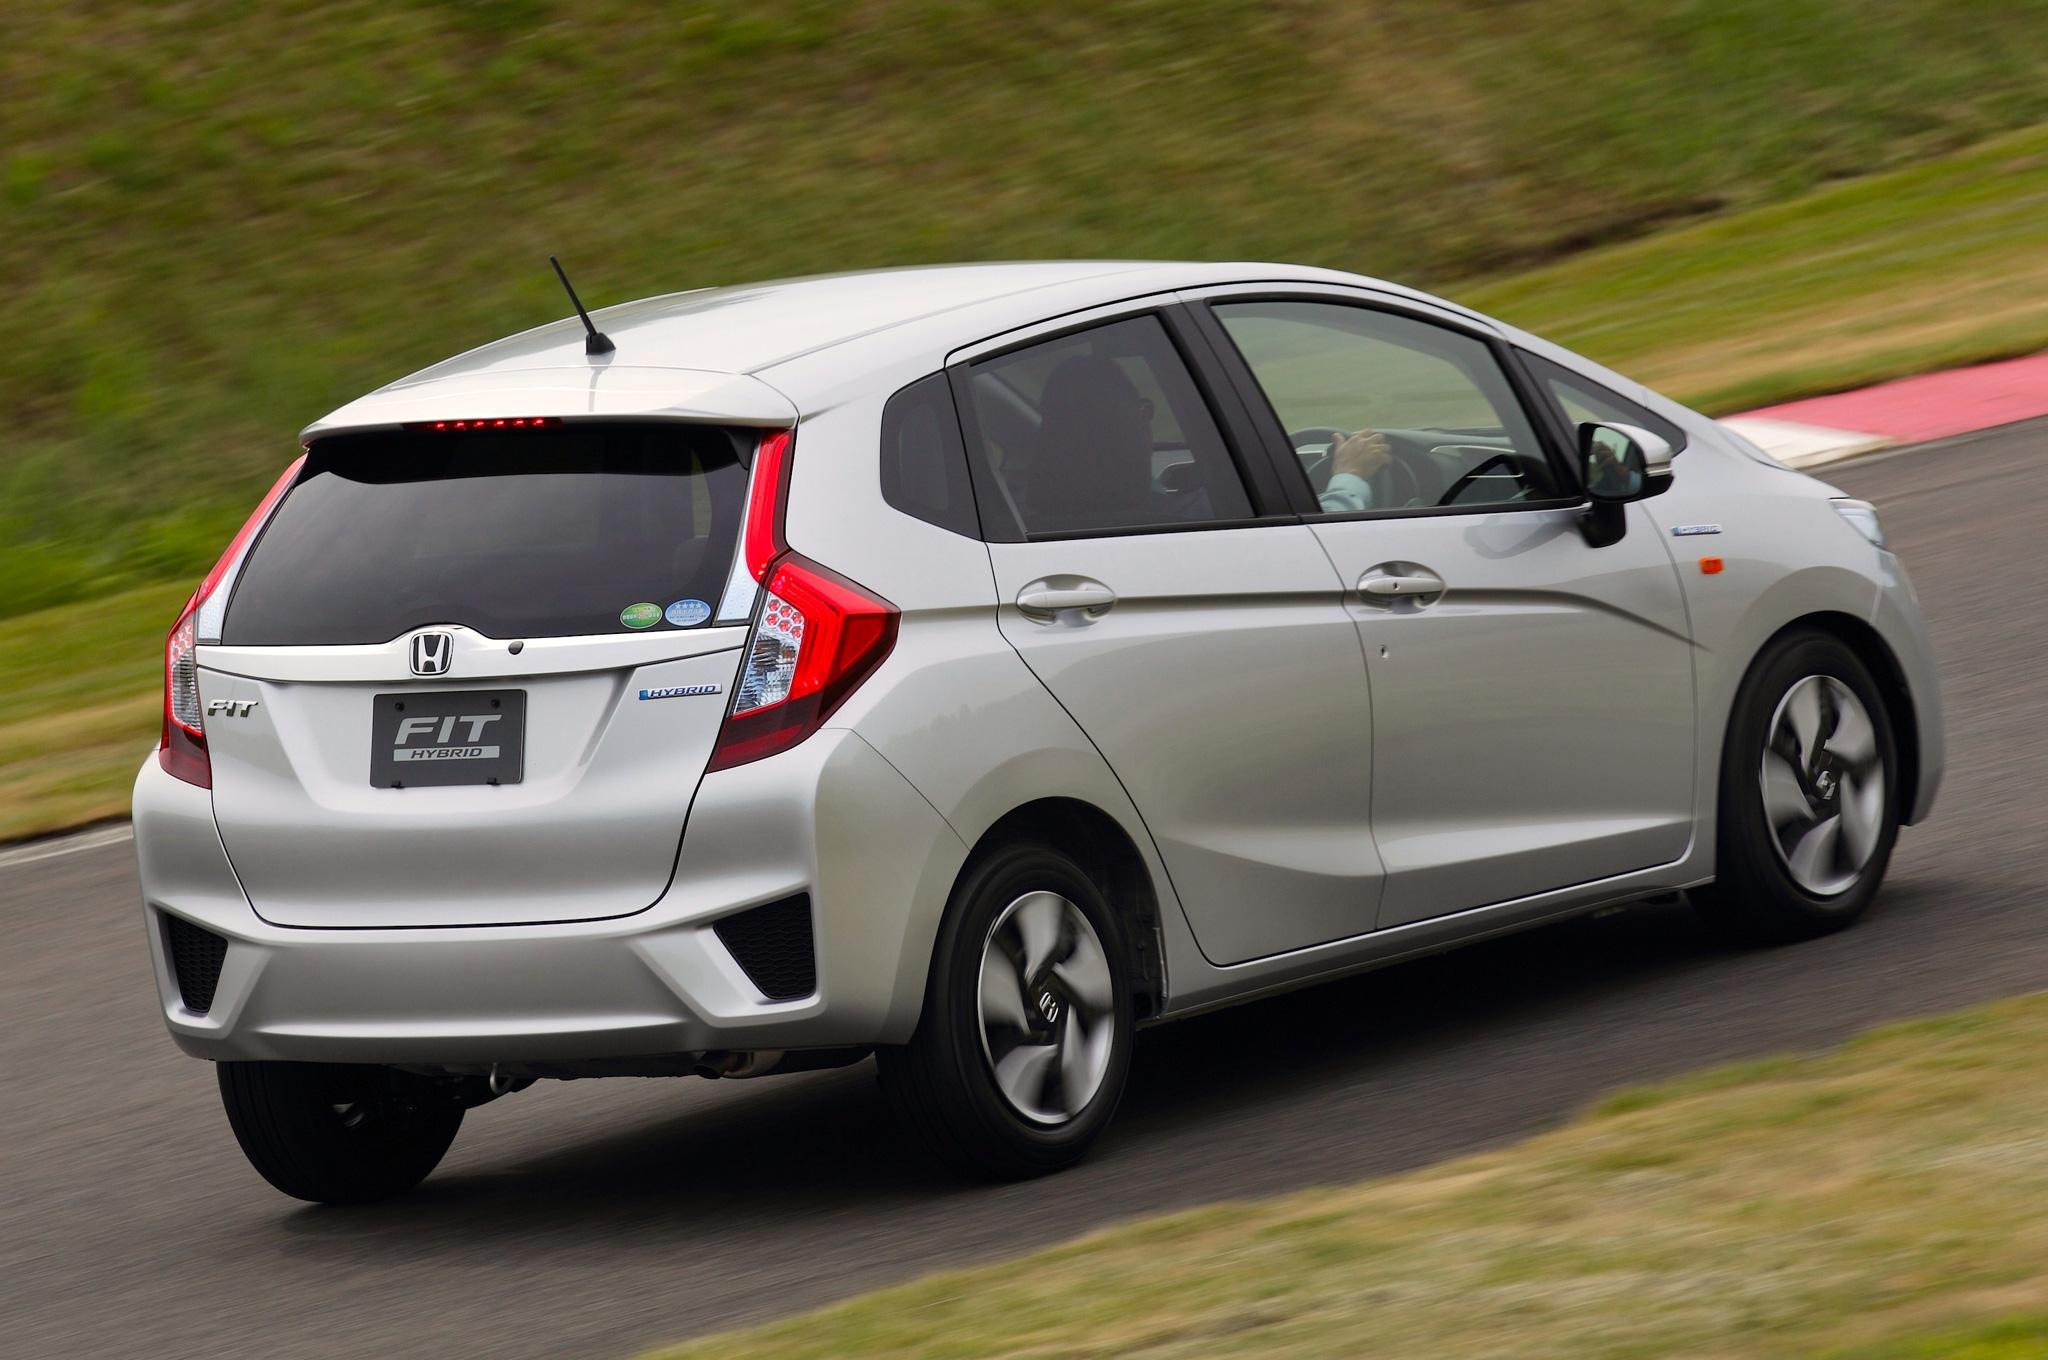 Honda Jazz: Third Generation City Car Revealed